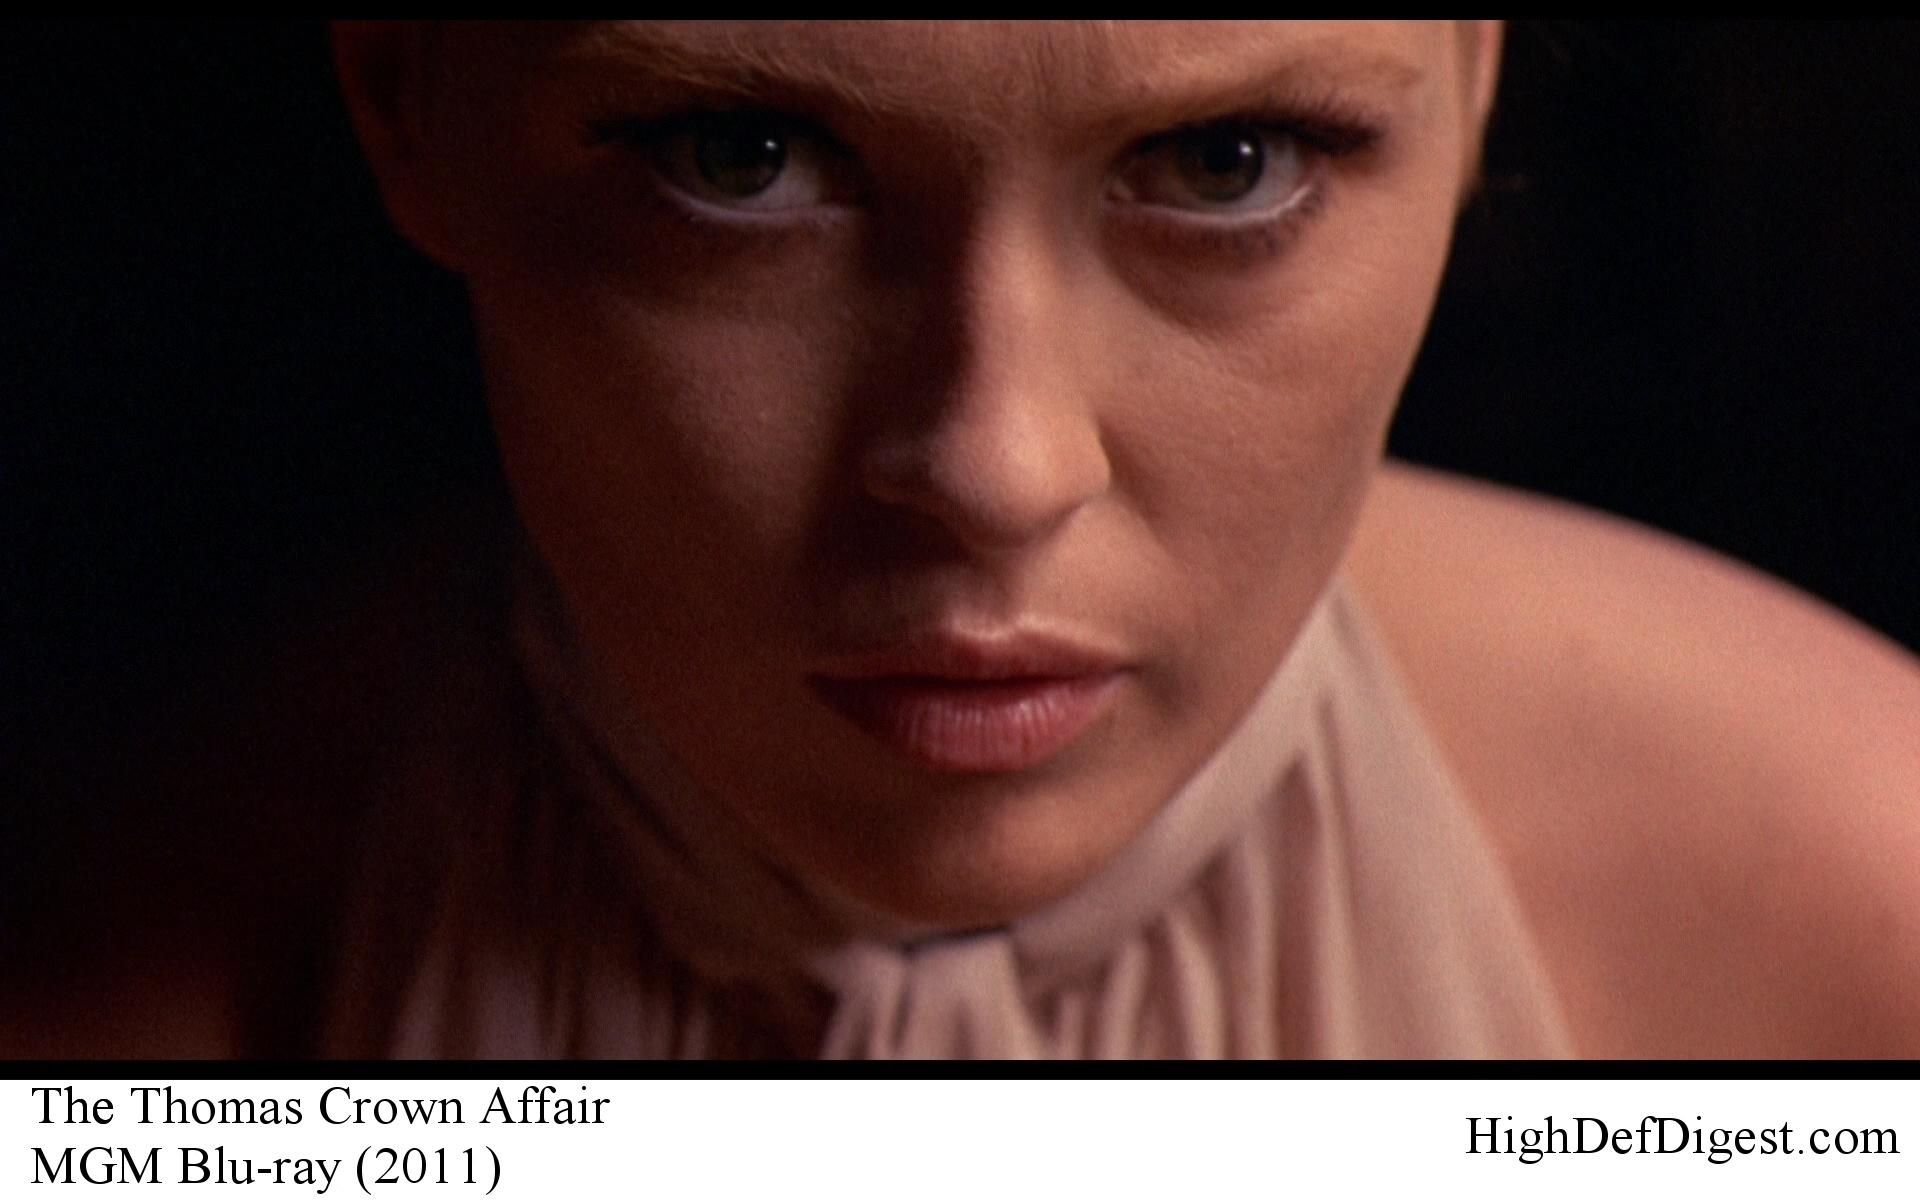 The Thomas Crown Affair - Faye Dunaway Comparison MGM